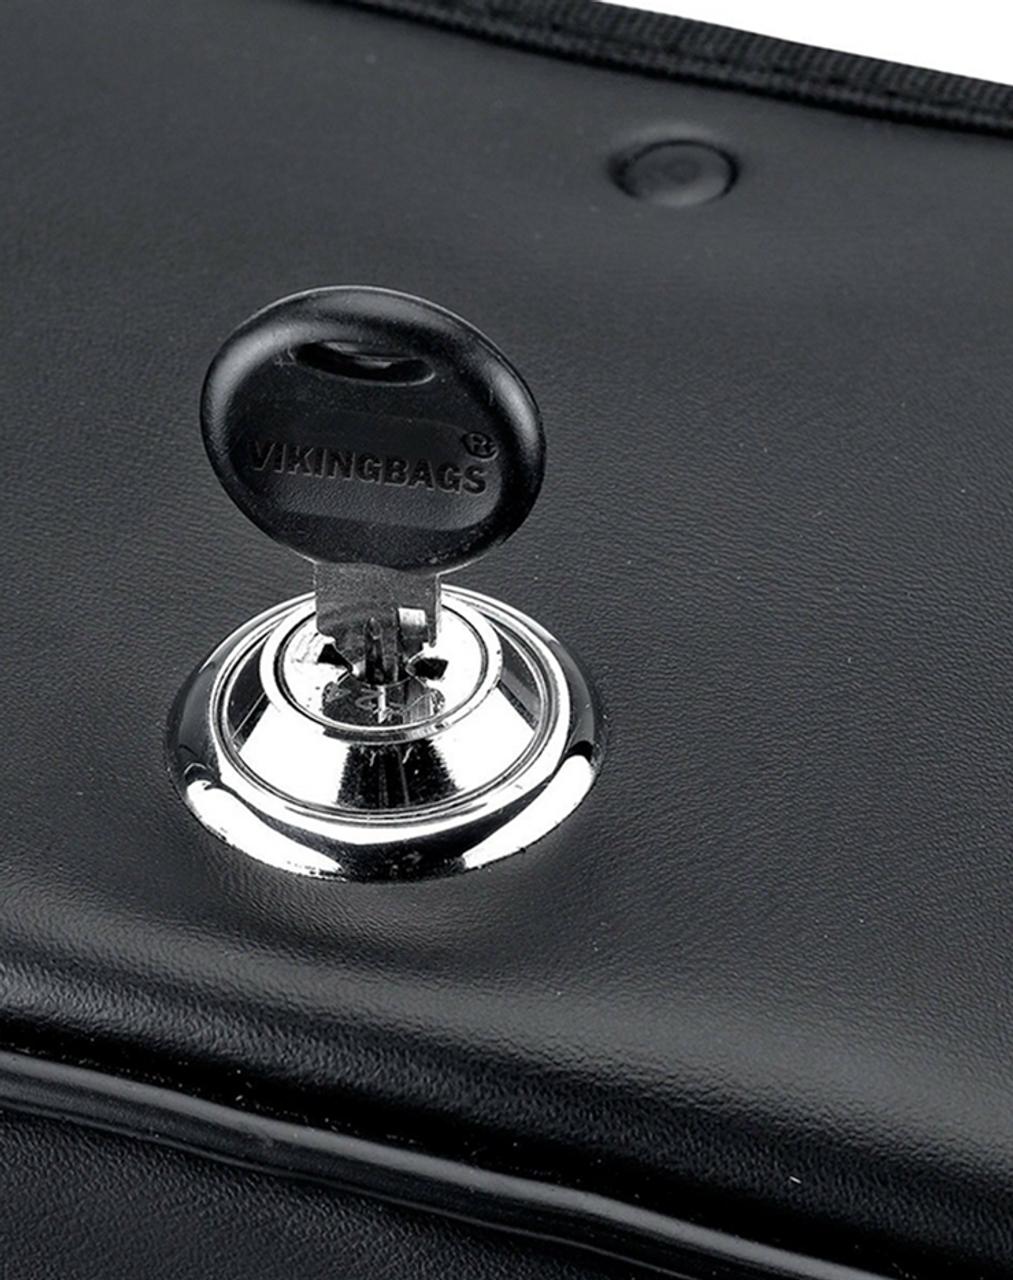 Triumph Rocket III Range Charger Single Strap Studded Medium Motorcycle Saddlebags Key Lock View